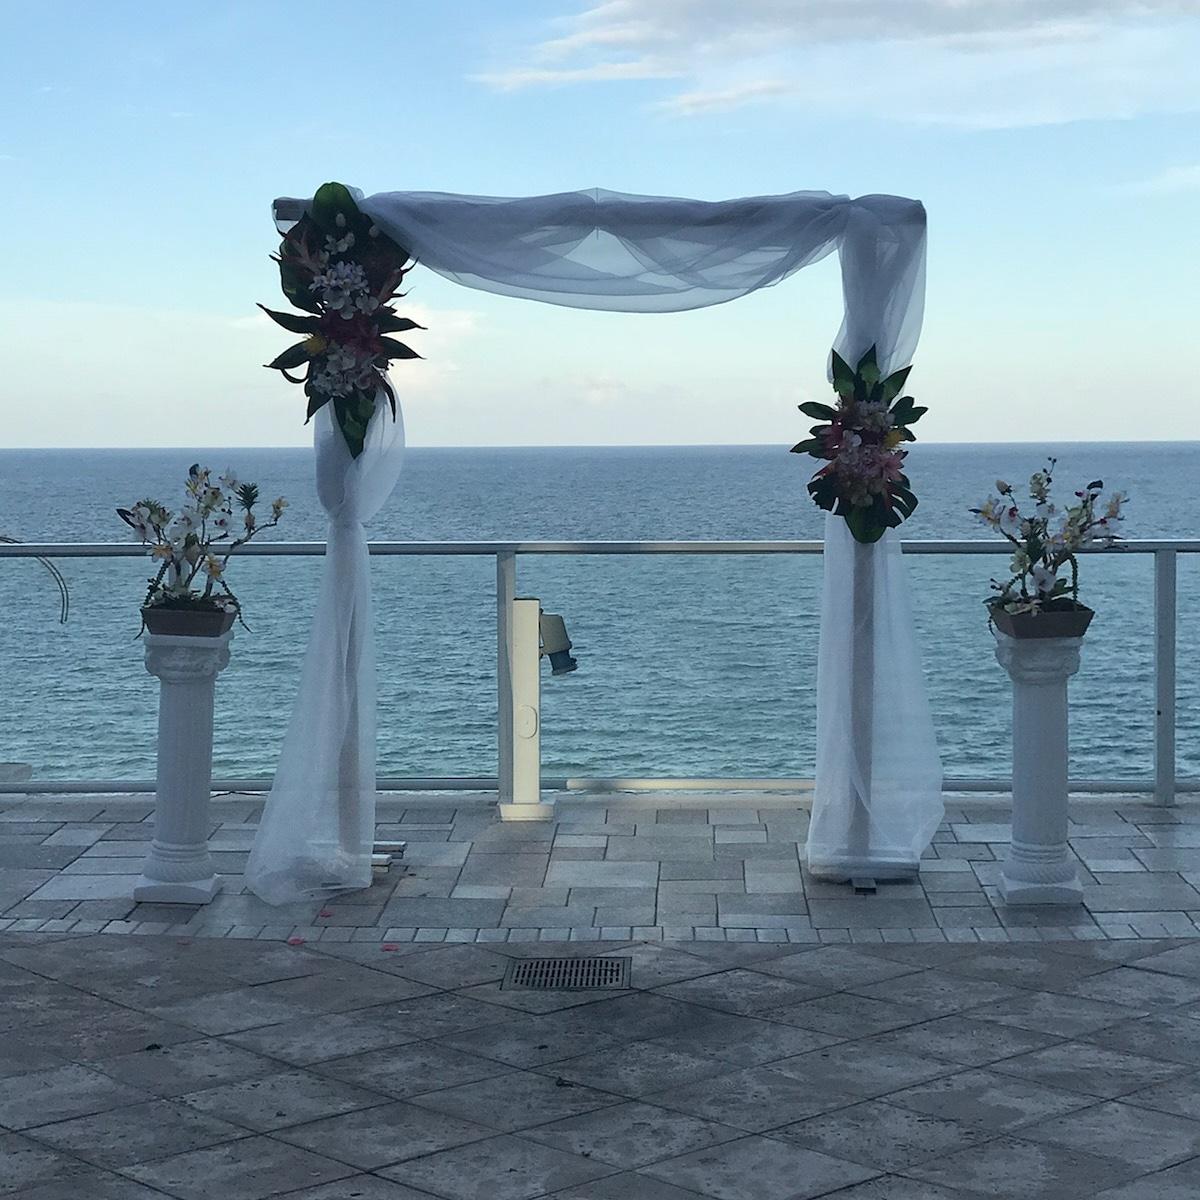 Bamboo Wedding Arch: Bamboo Chuppah Or Arch Wedding Rental Miami